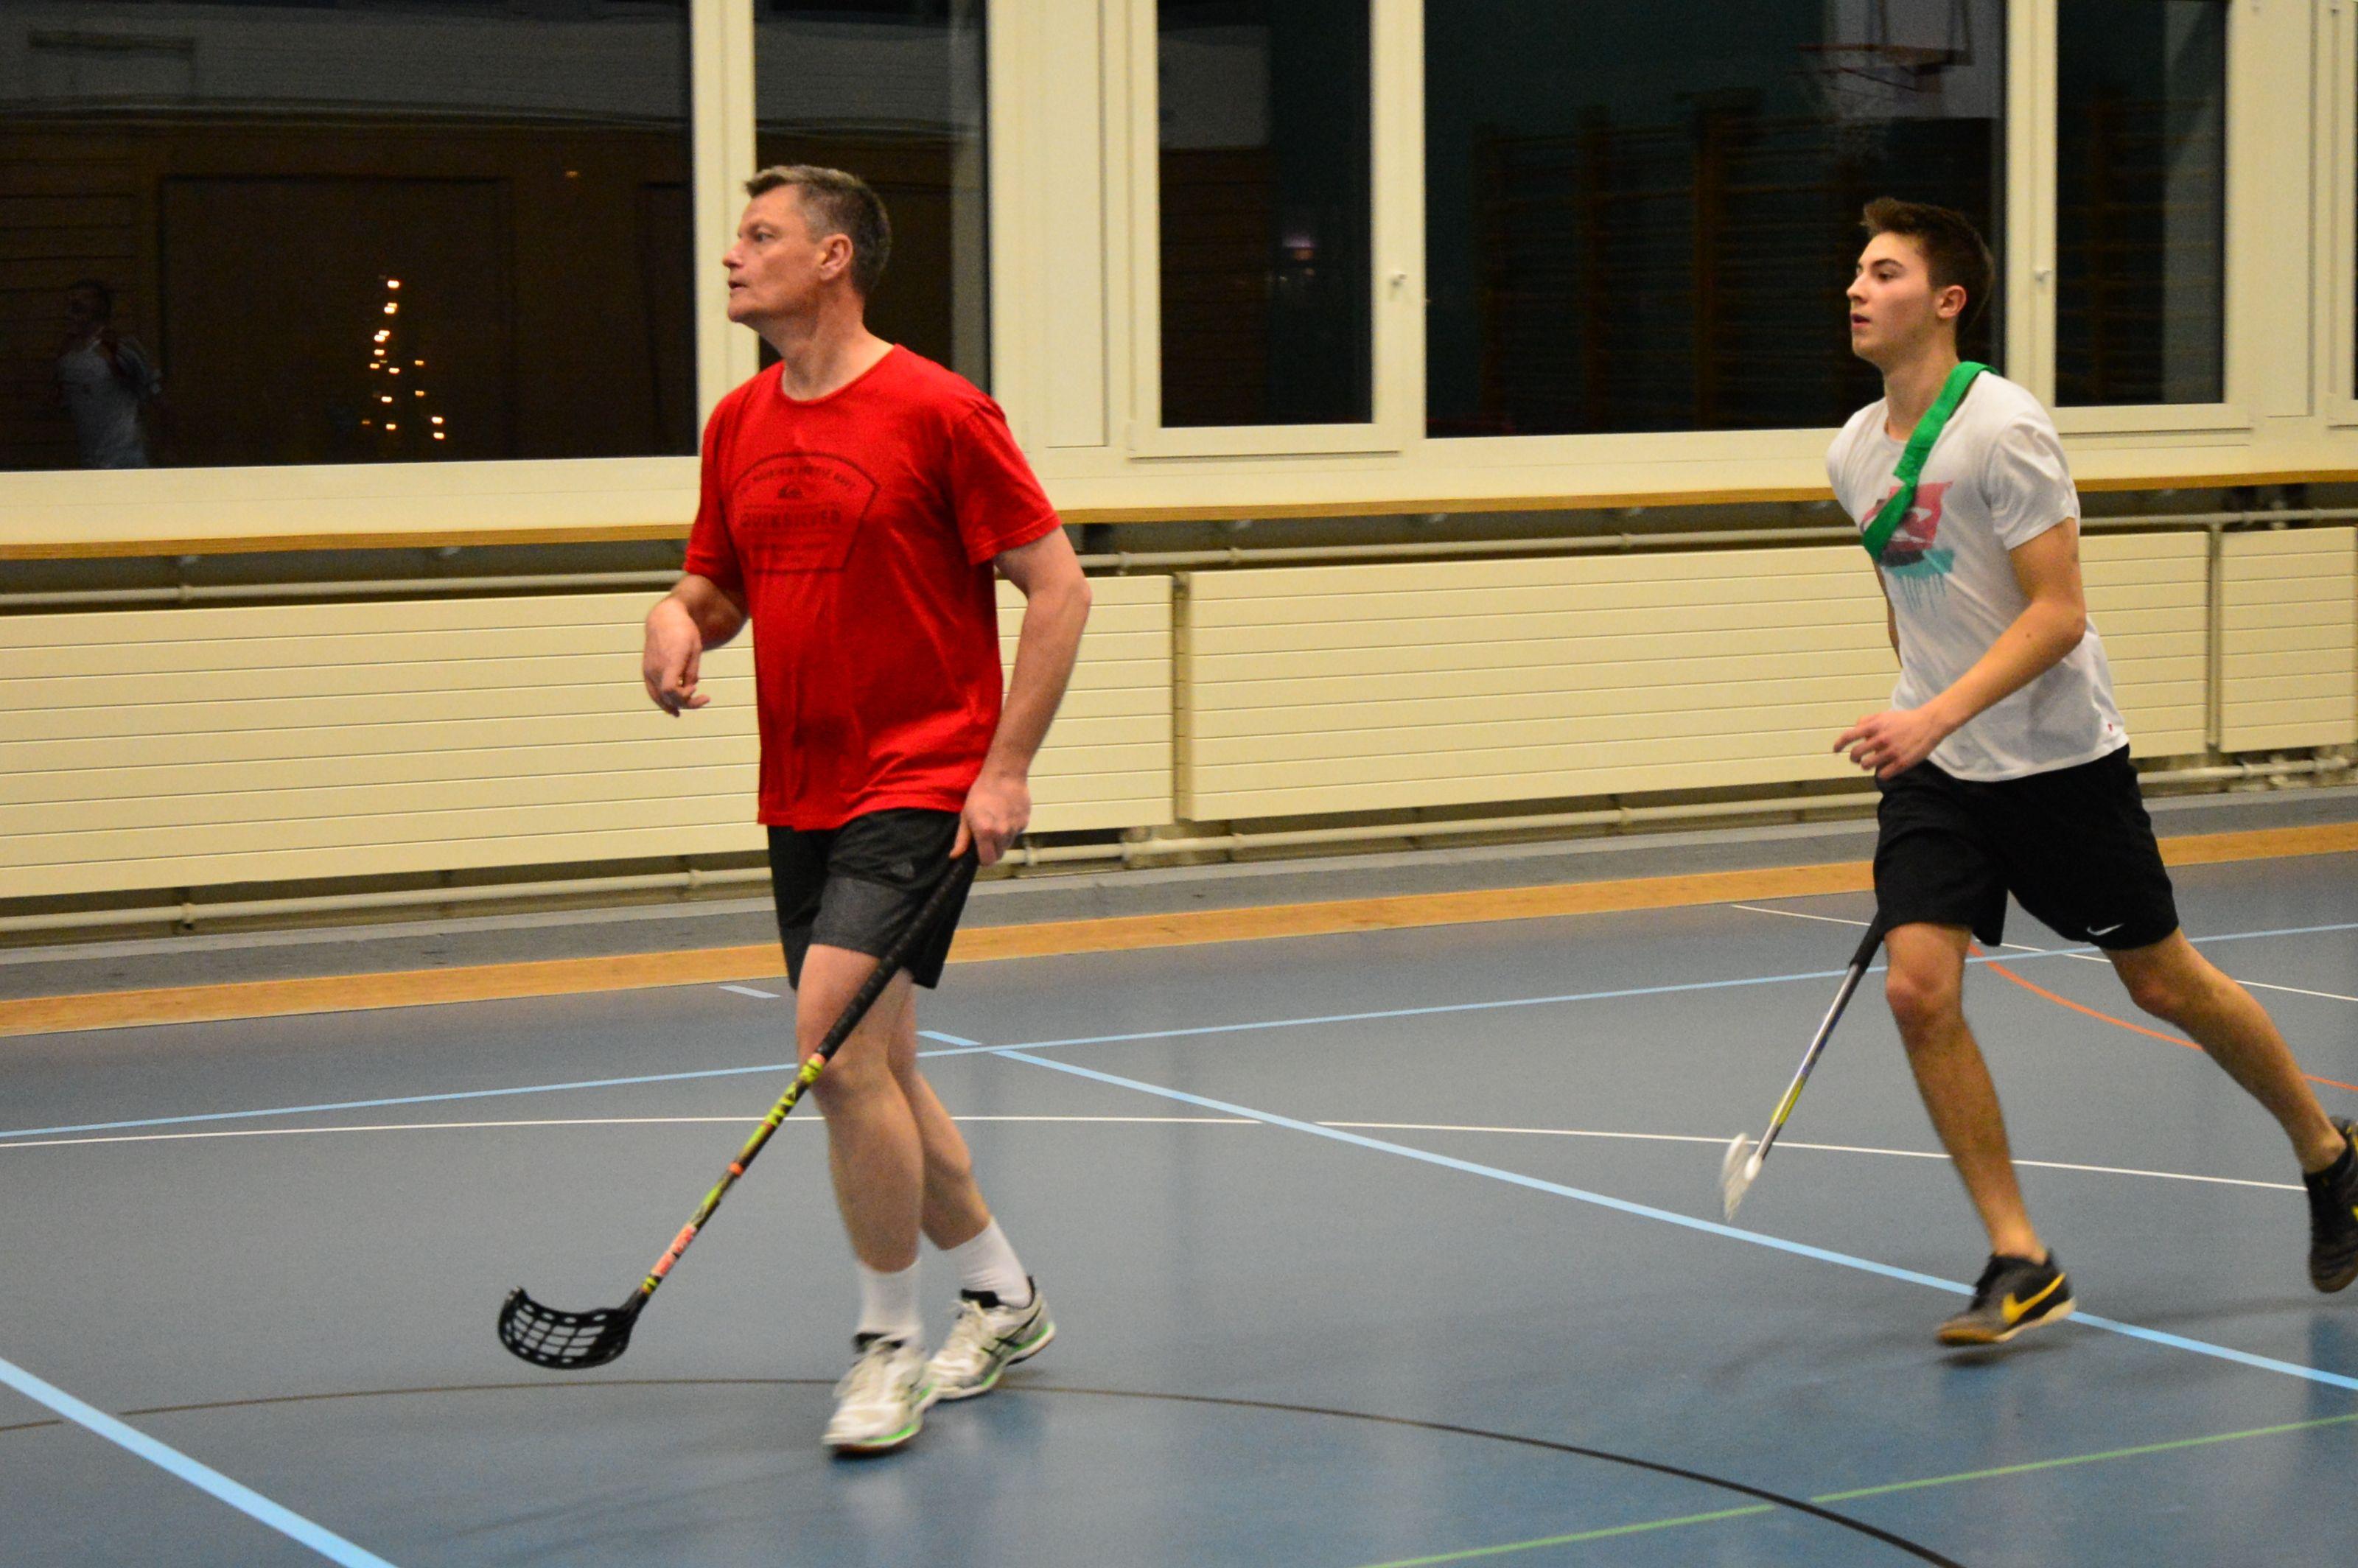 TSVJ-SF-2015-12-08-Unihockey-DSC-CE-8265-web